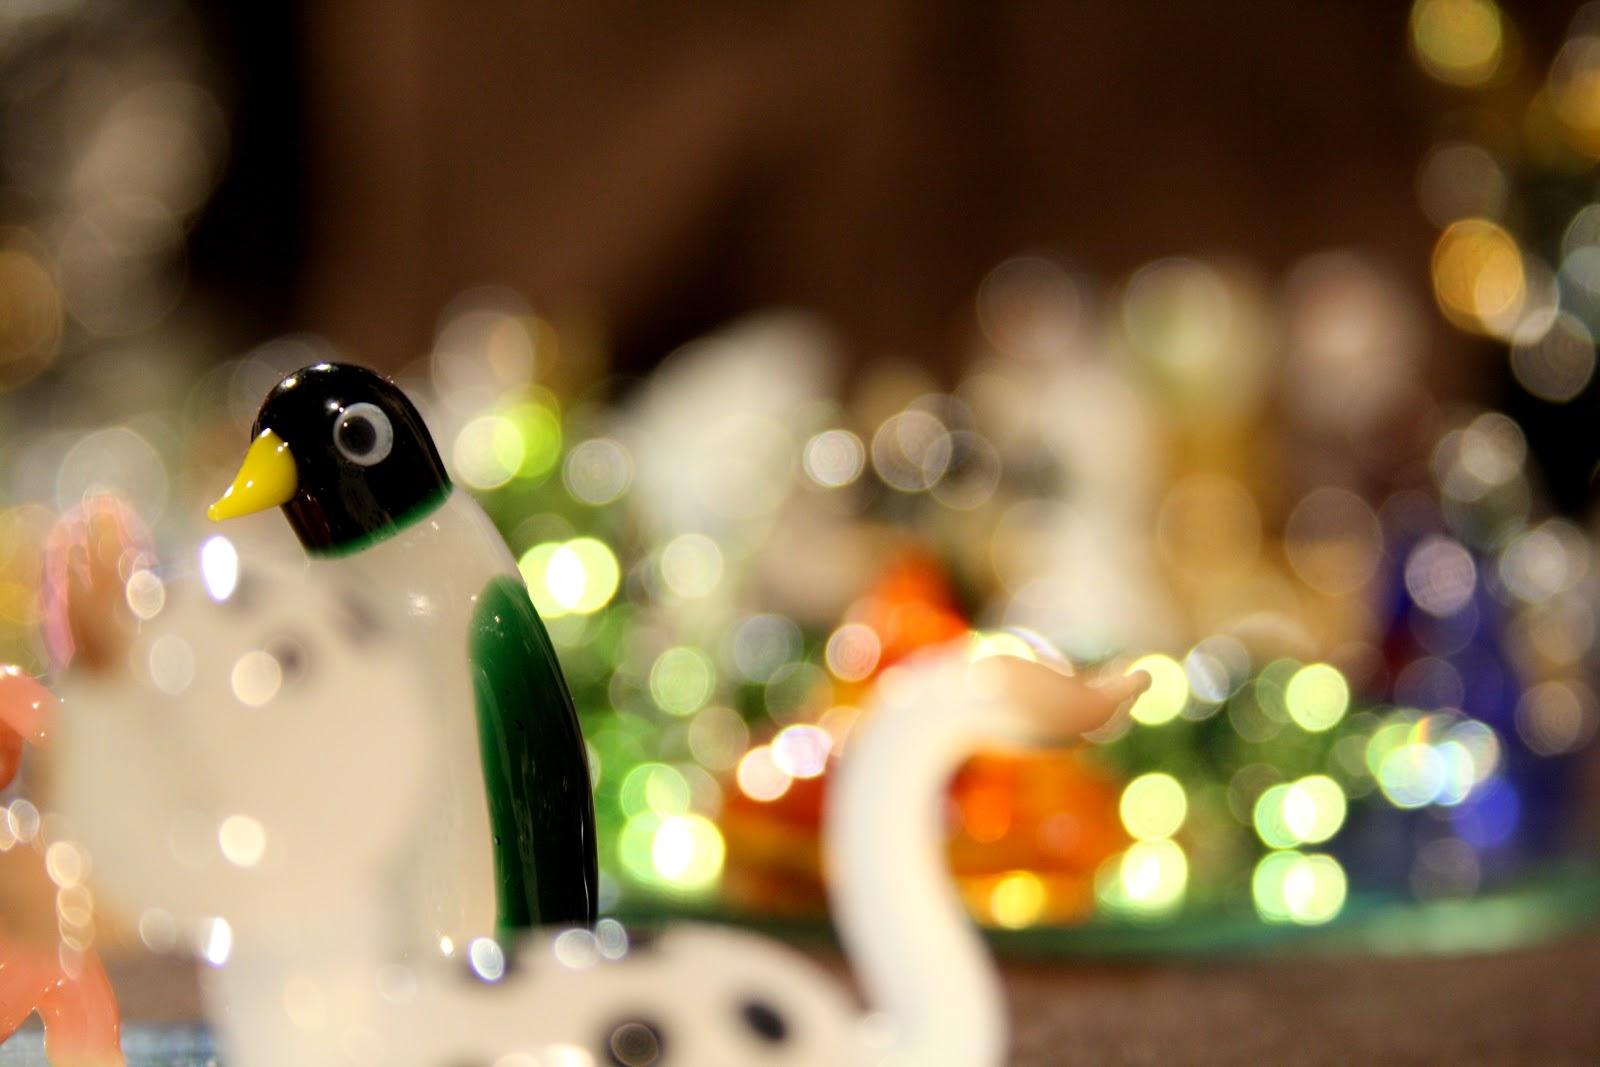 Pingouin en verre au marché de noël de Gendarmenmarkt